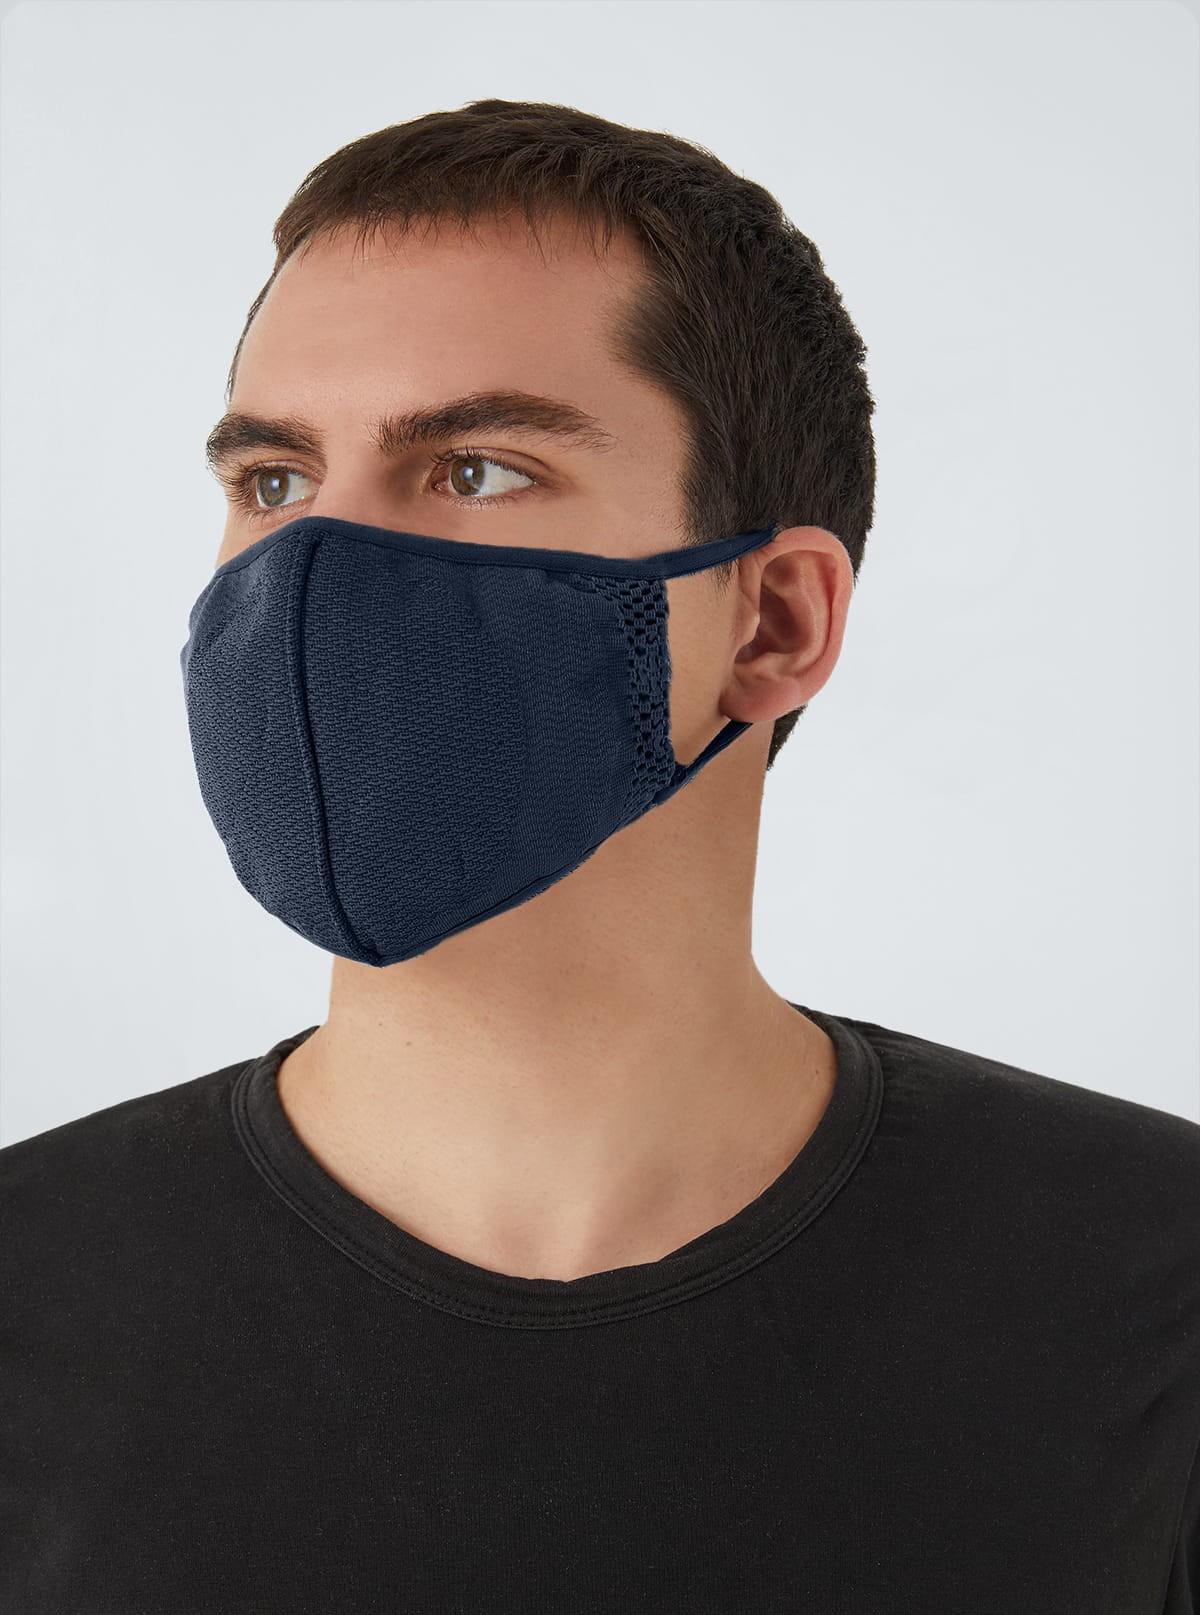 Carbon-Mask Pro filtrantes, antiestáticas, antivírico, antidroplet, lavables